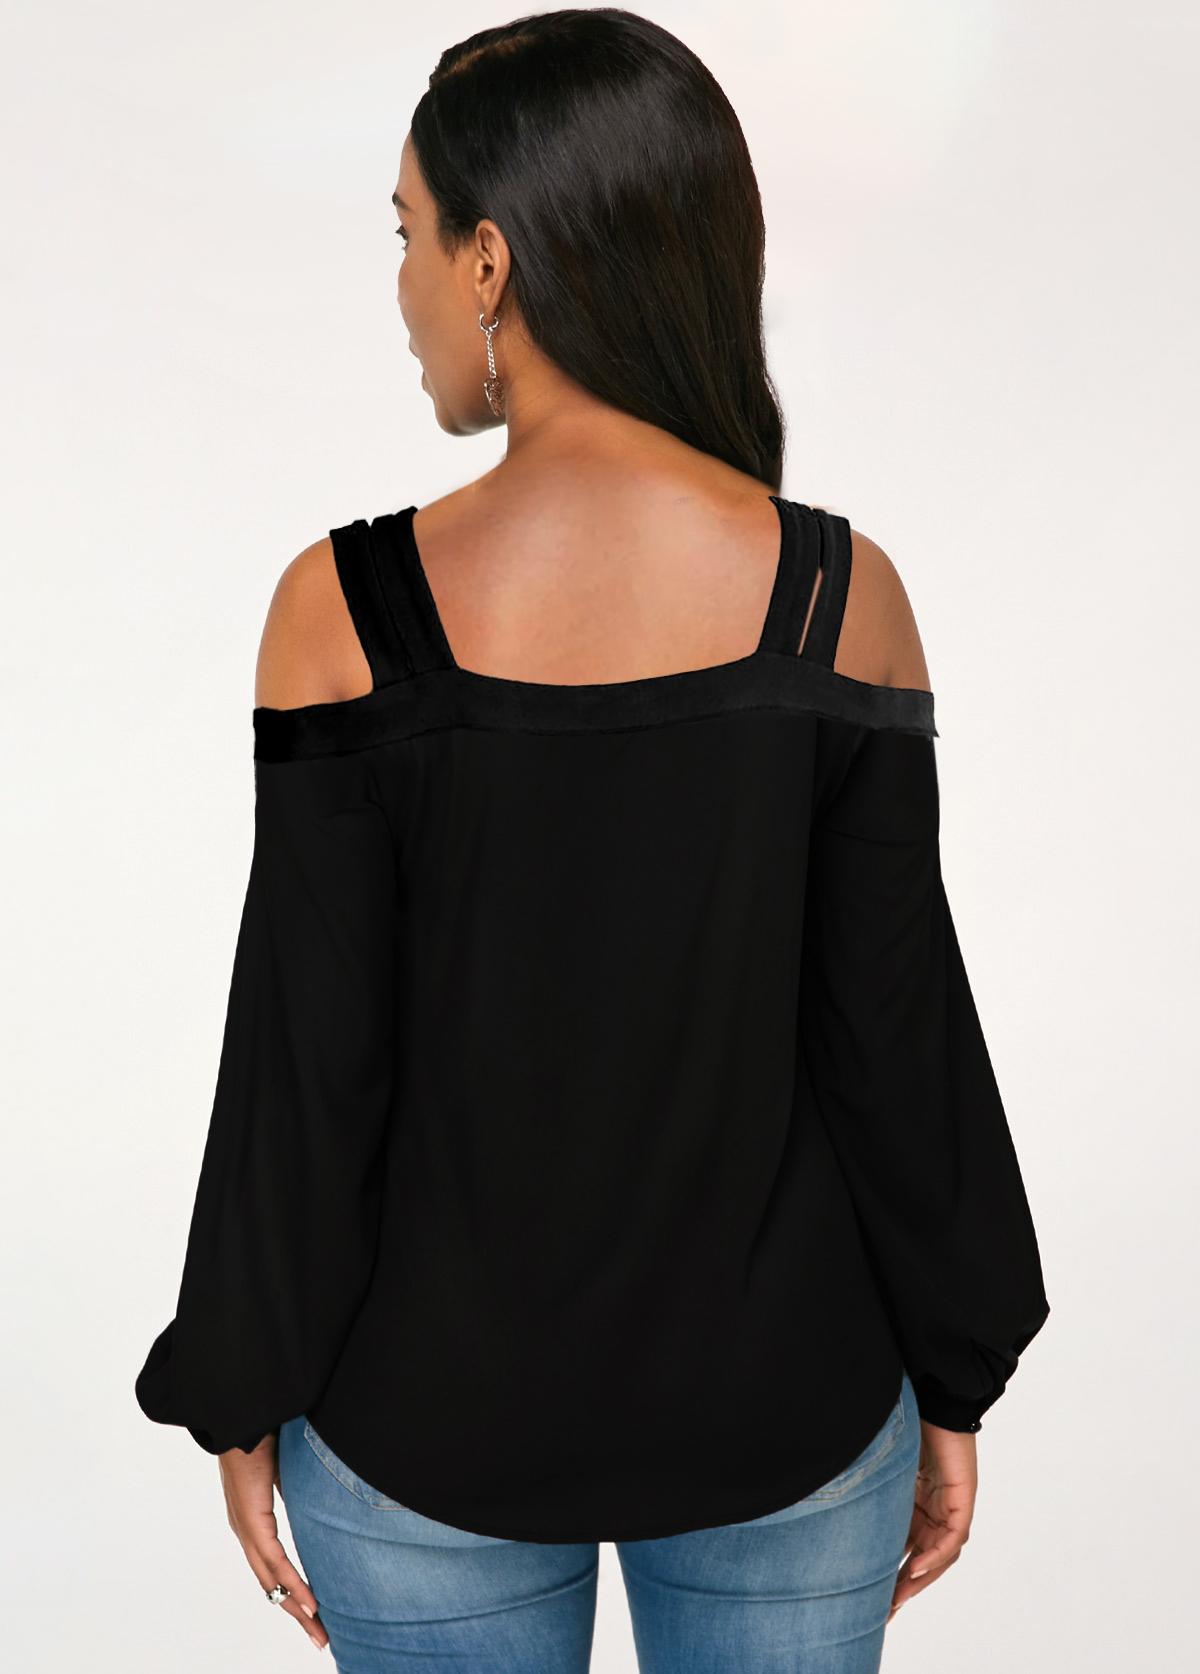 Double Straps Cold Shoulder Solid T Shirt